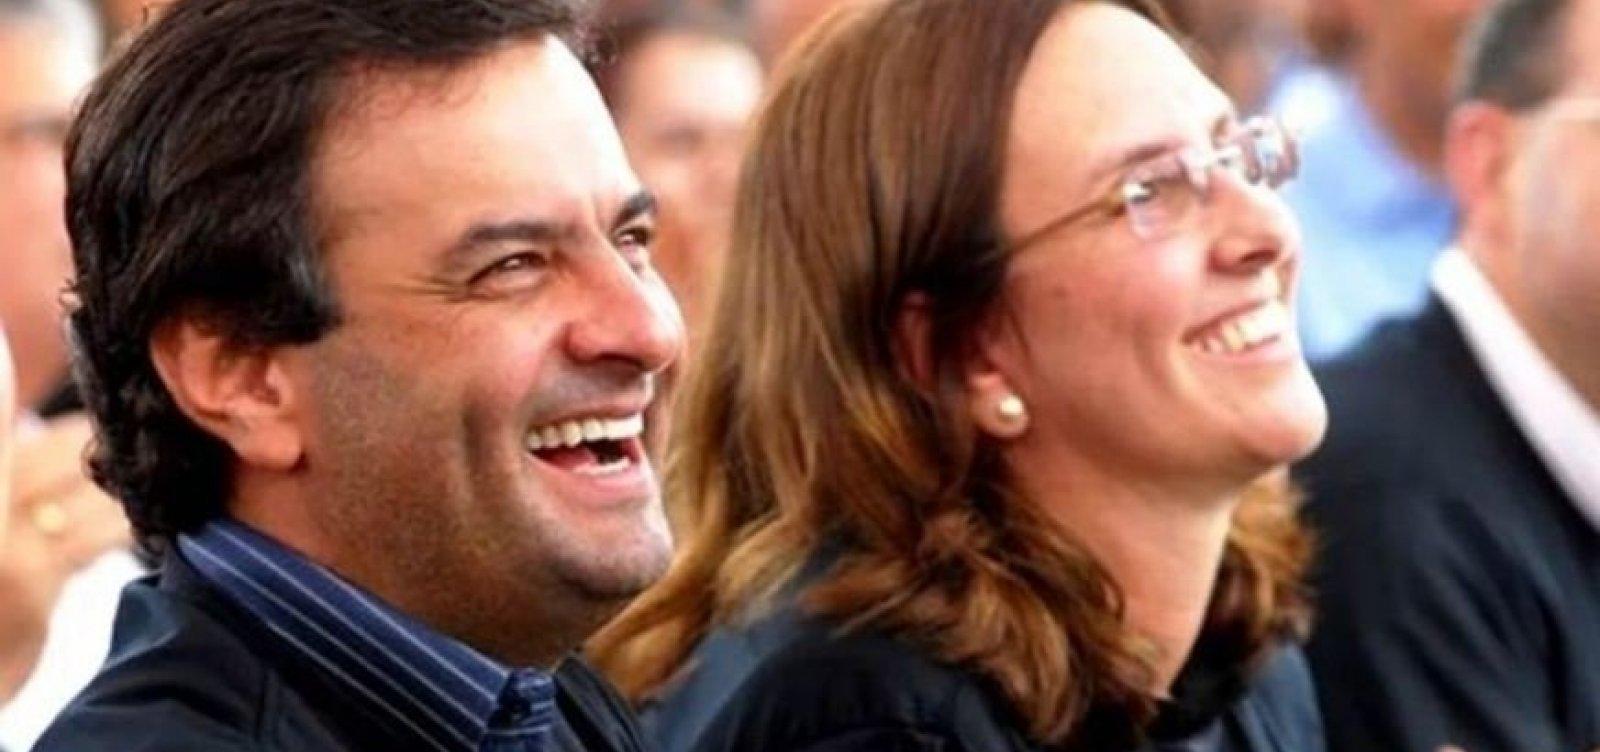 [Irmã de Aécio, Andrea Neves é indiciada sob suspeita de crime relacionado a vazamentos na PF]